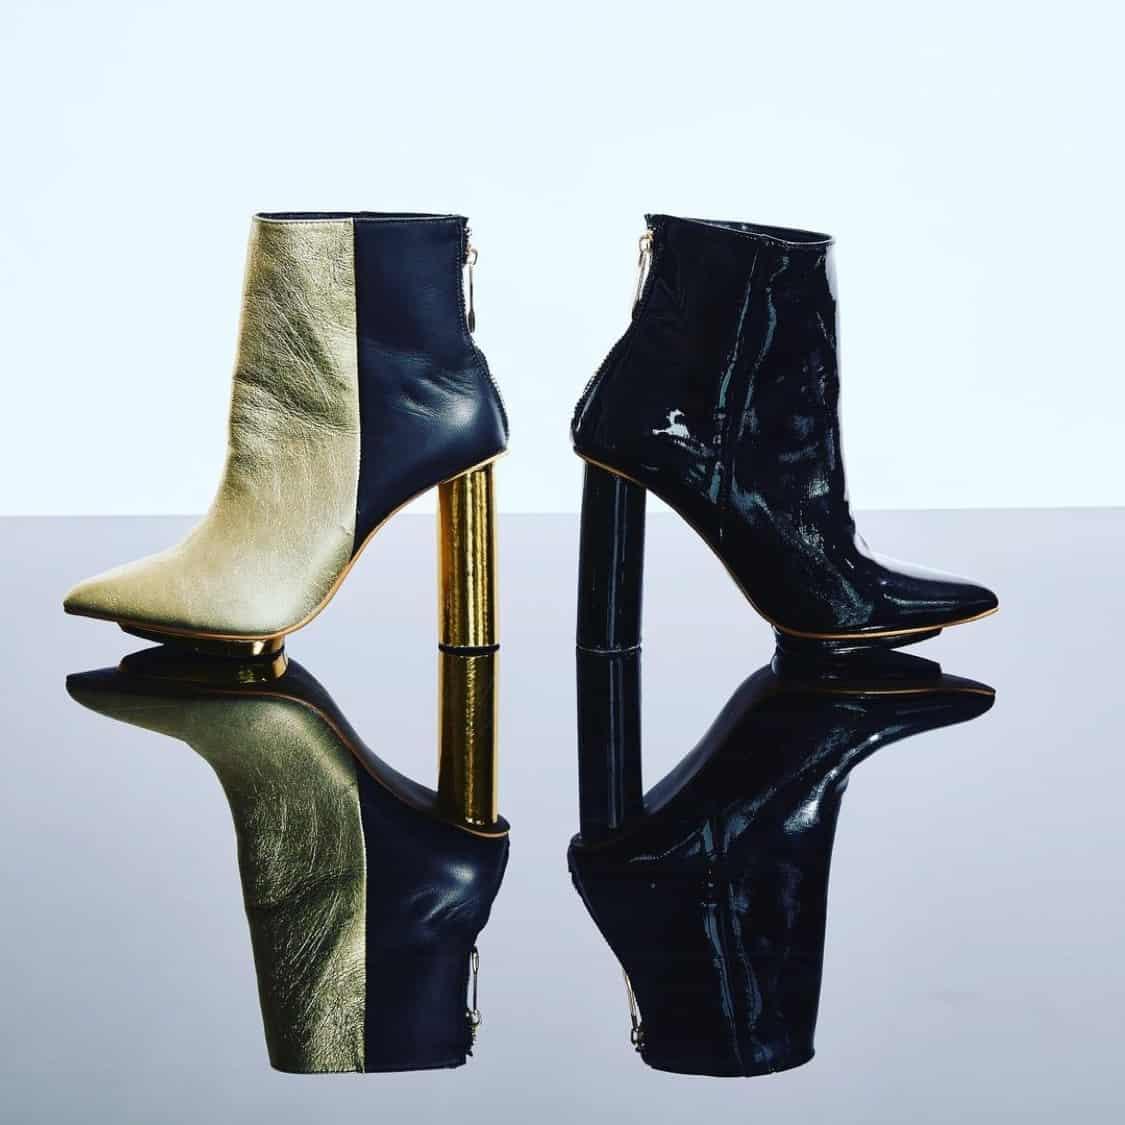 Beautiisole fashionable comfortable shoes